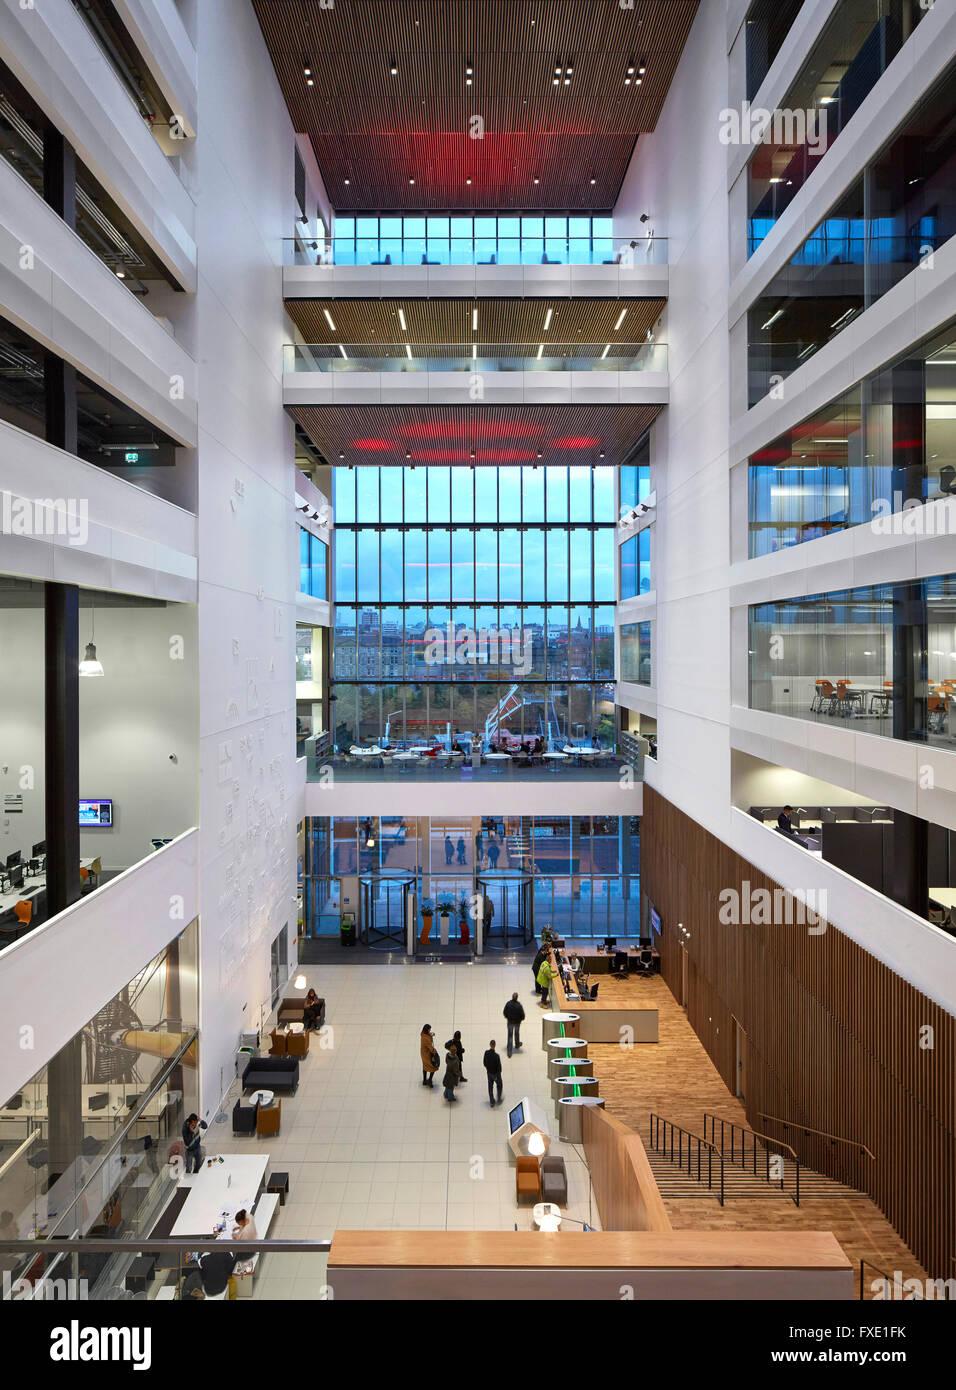 High Level Interior View Of Main Atrium Space City Glasgow College